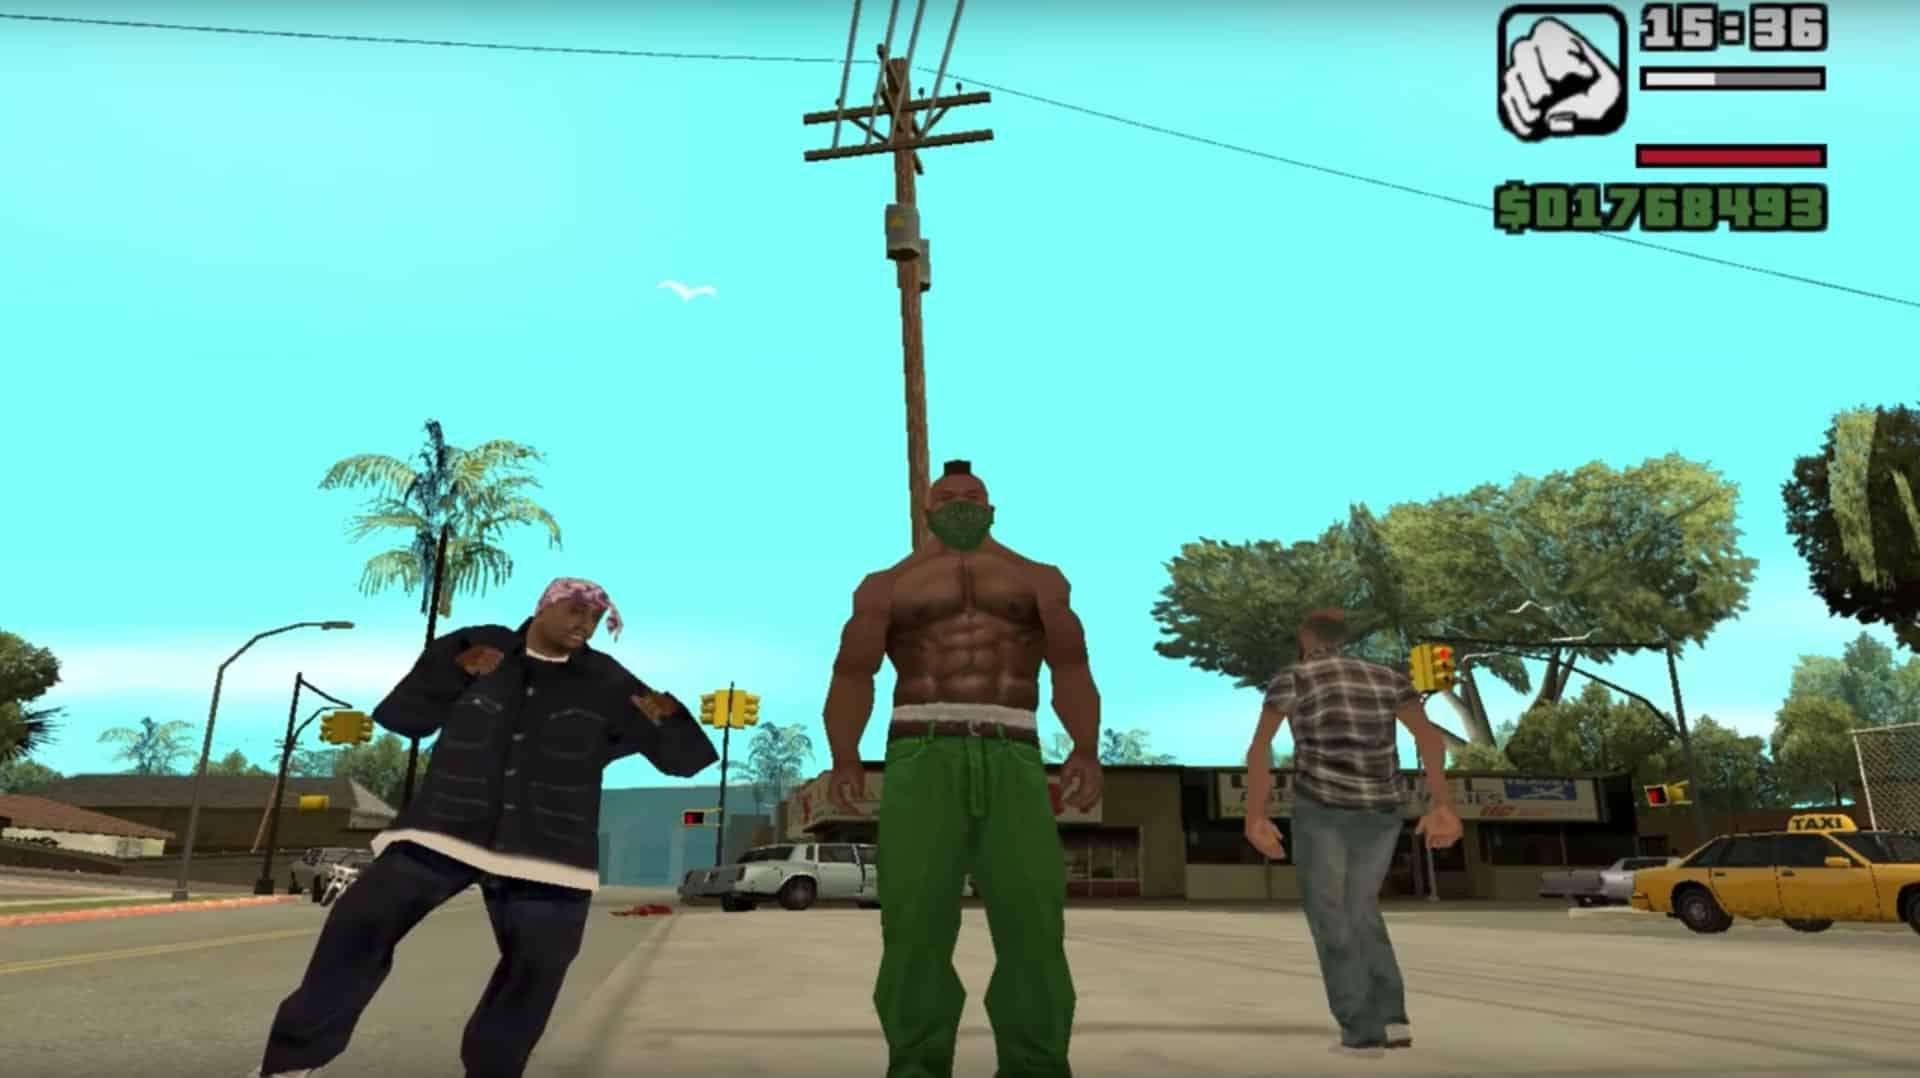 GTA San Andreas Cheats for All PlayStation Consoles - GTA BOOM